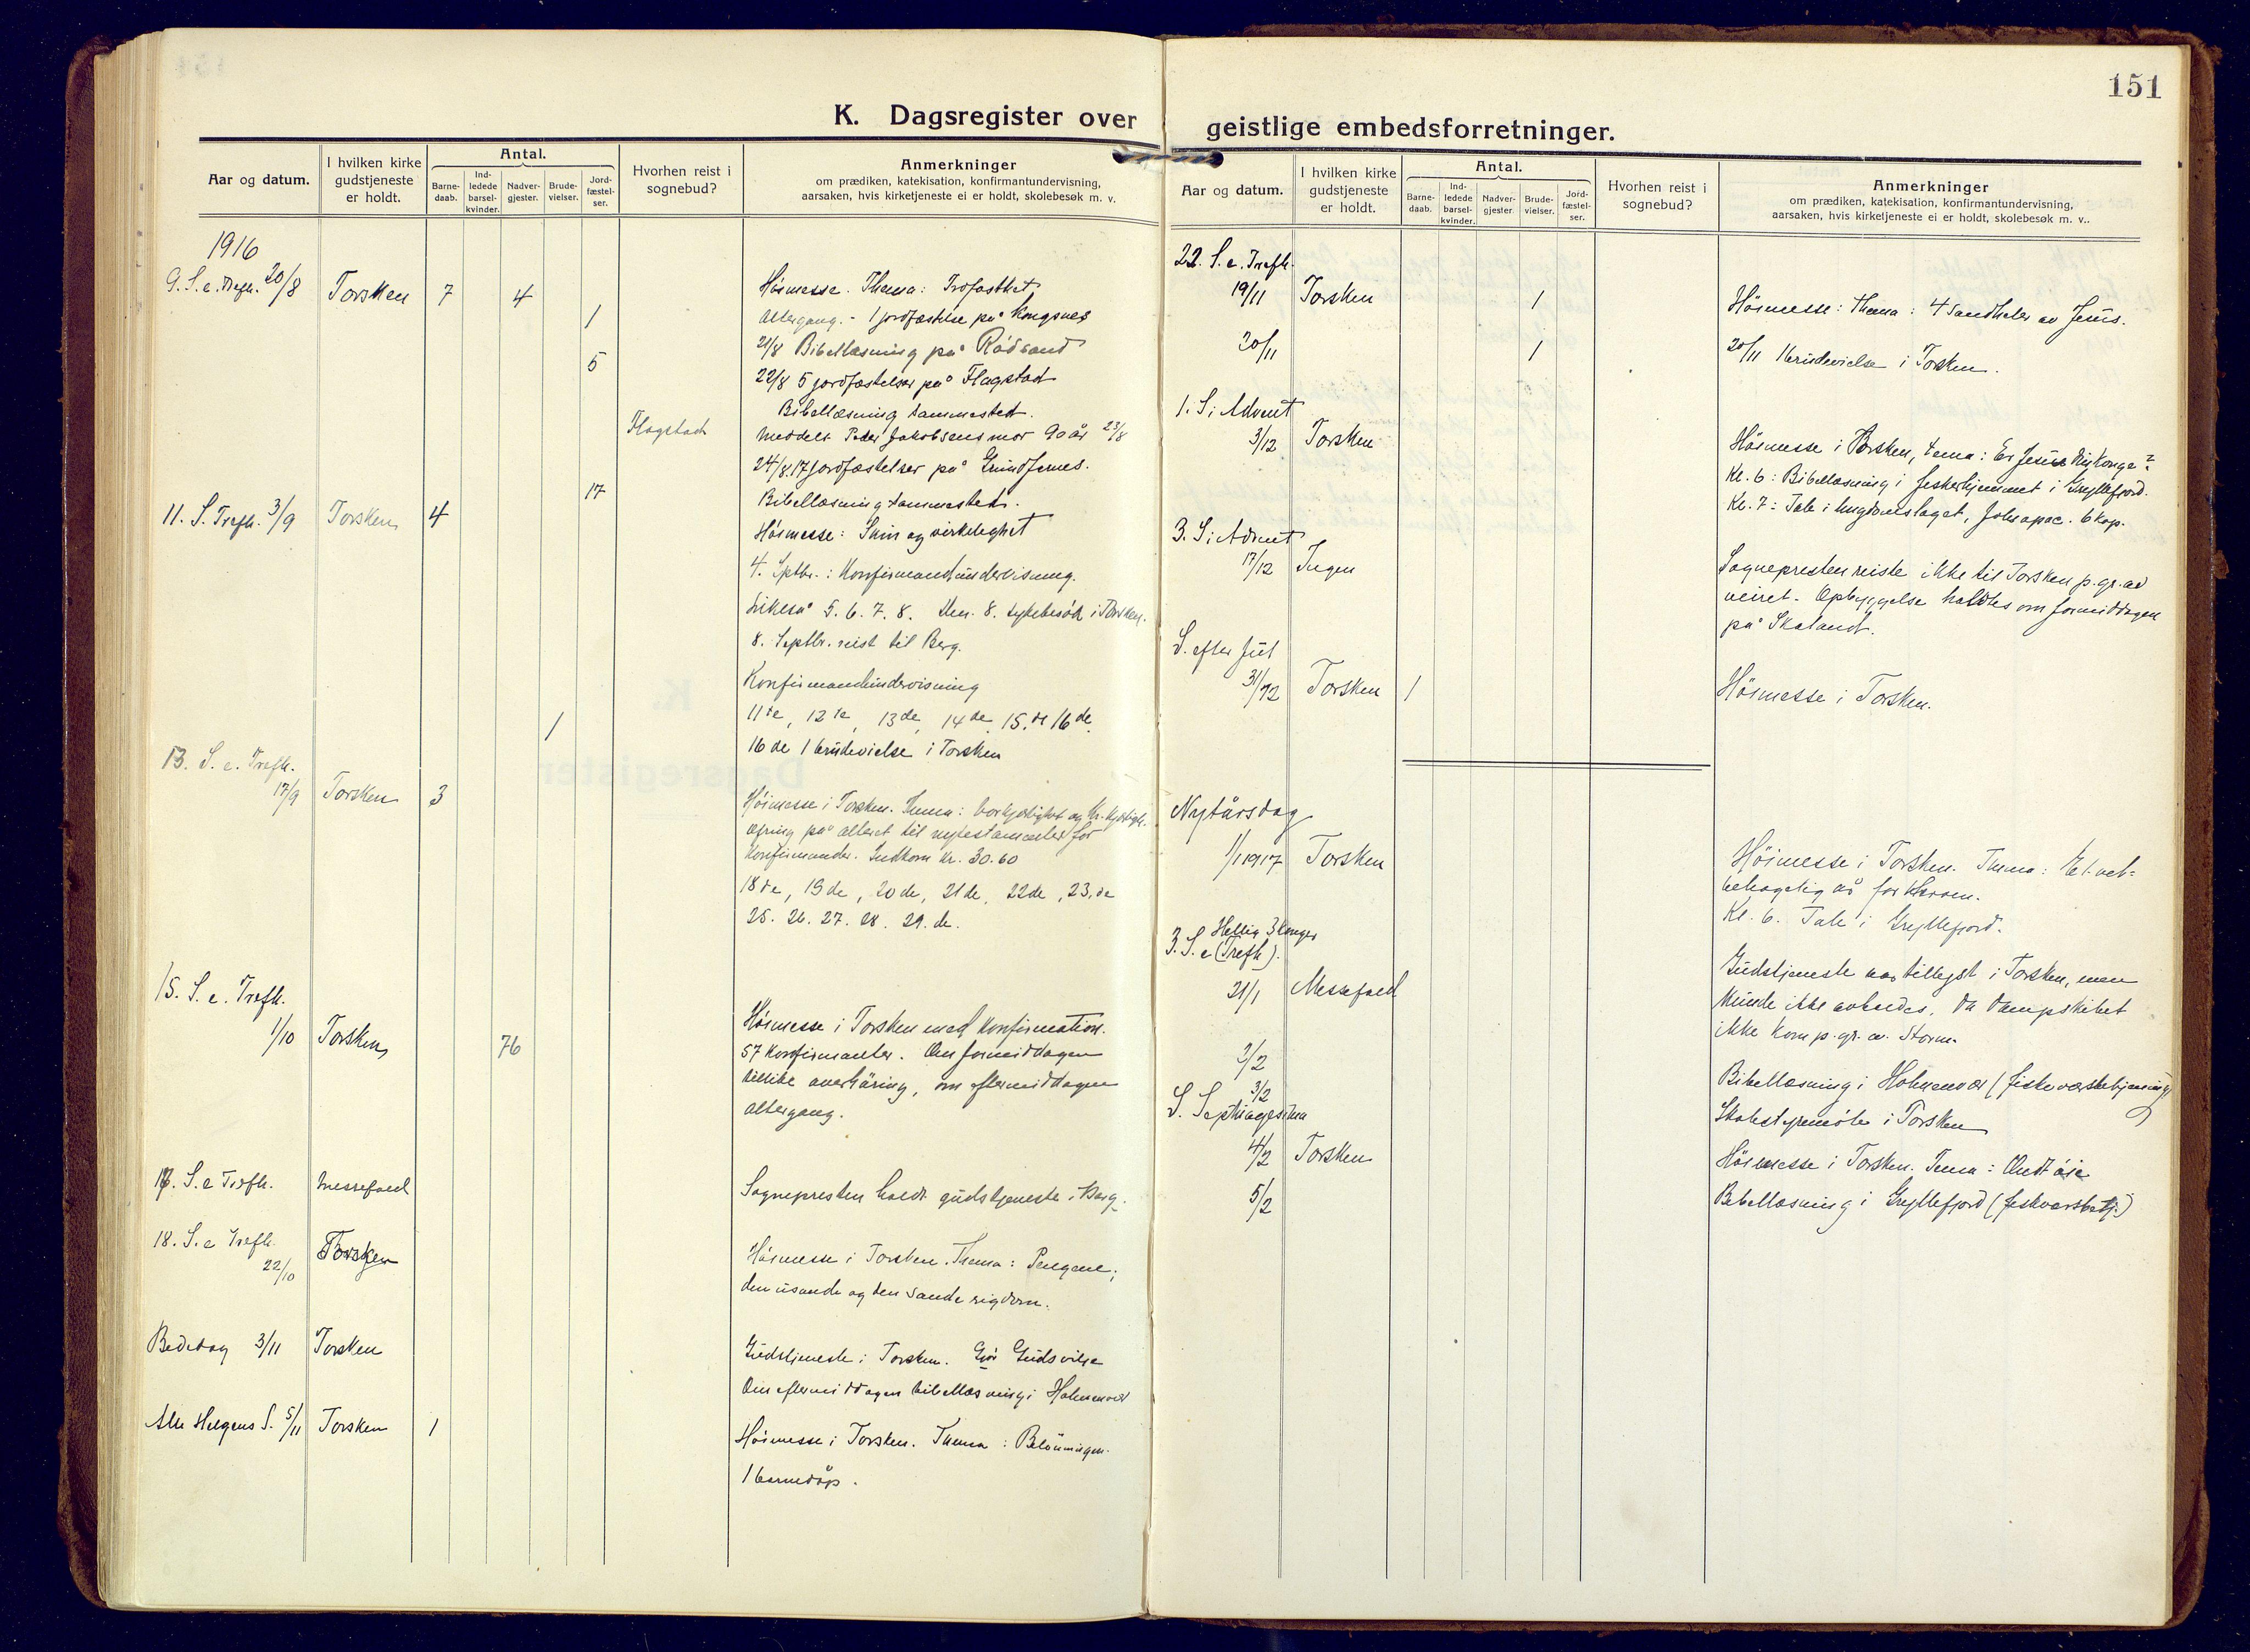 SATØ, Mefjord/Berg sokneprestkontor, G/Ga/Gaa: Ministerialbok nr. 10, 1916-1928, s. 151